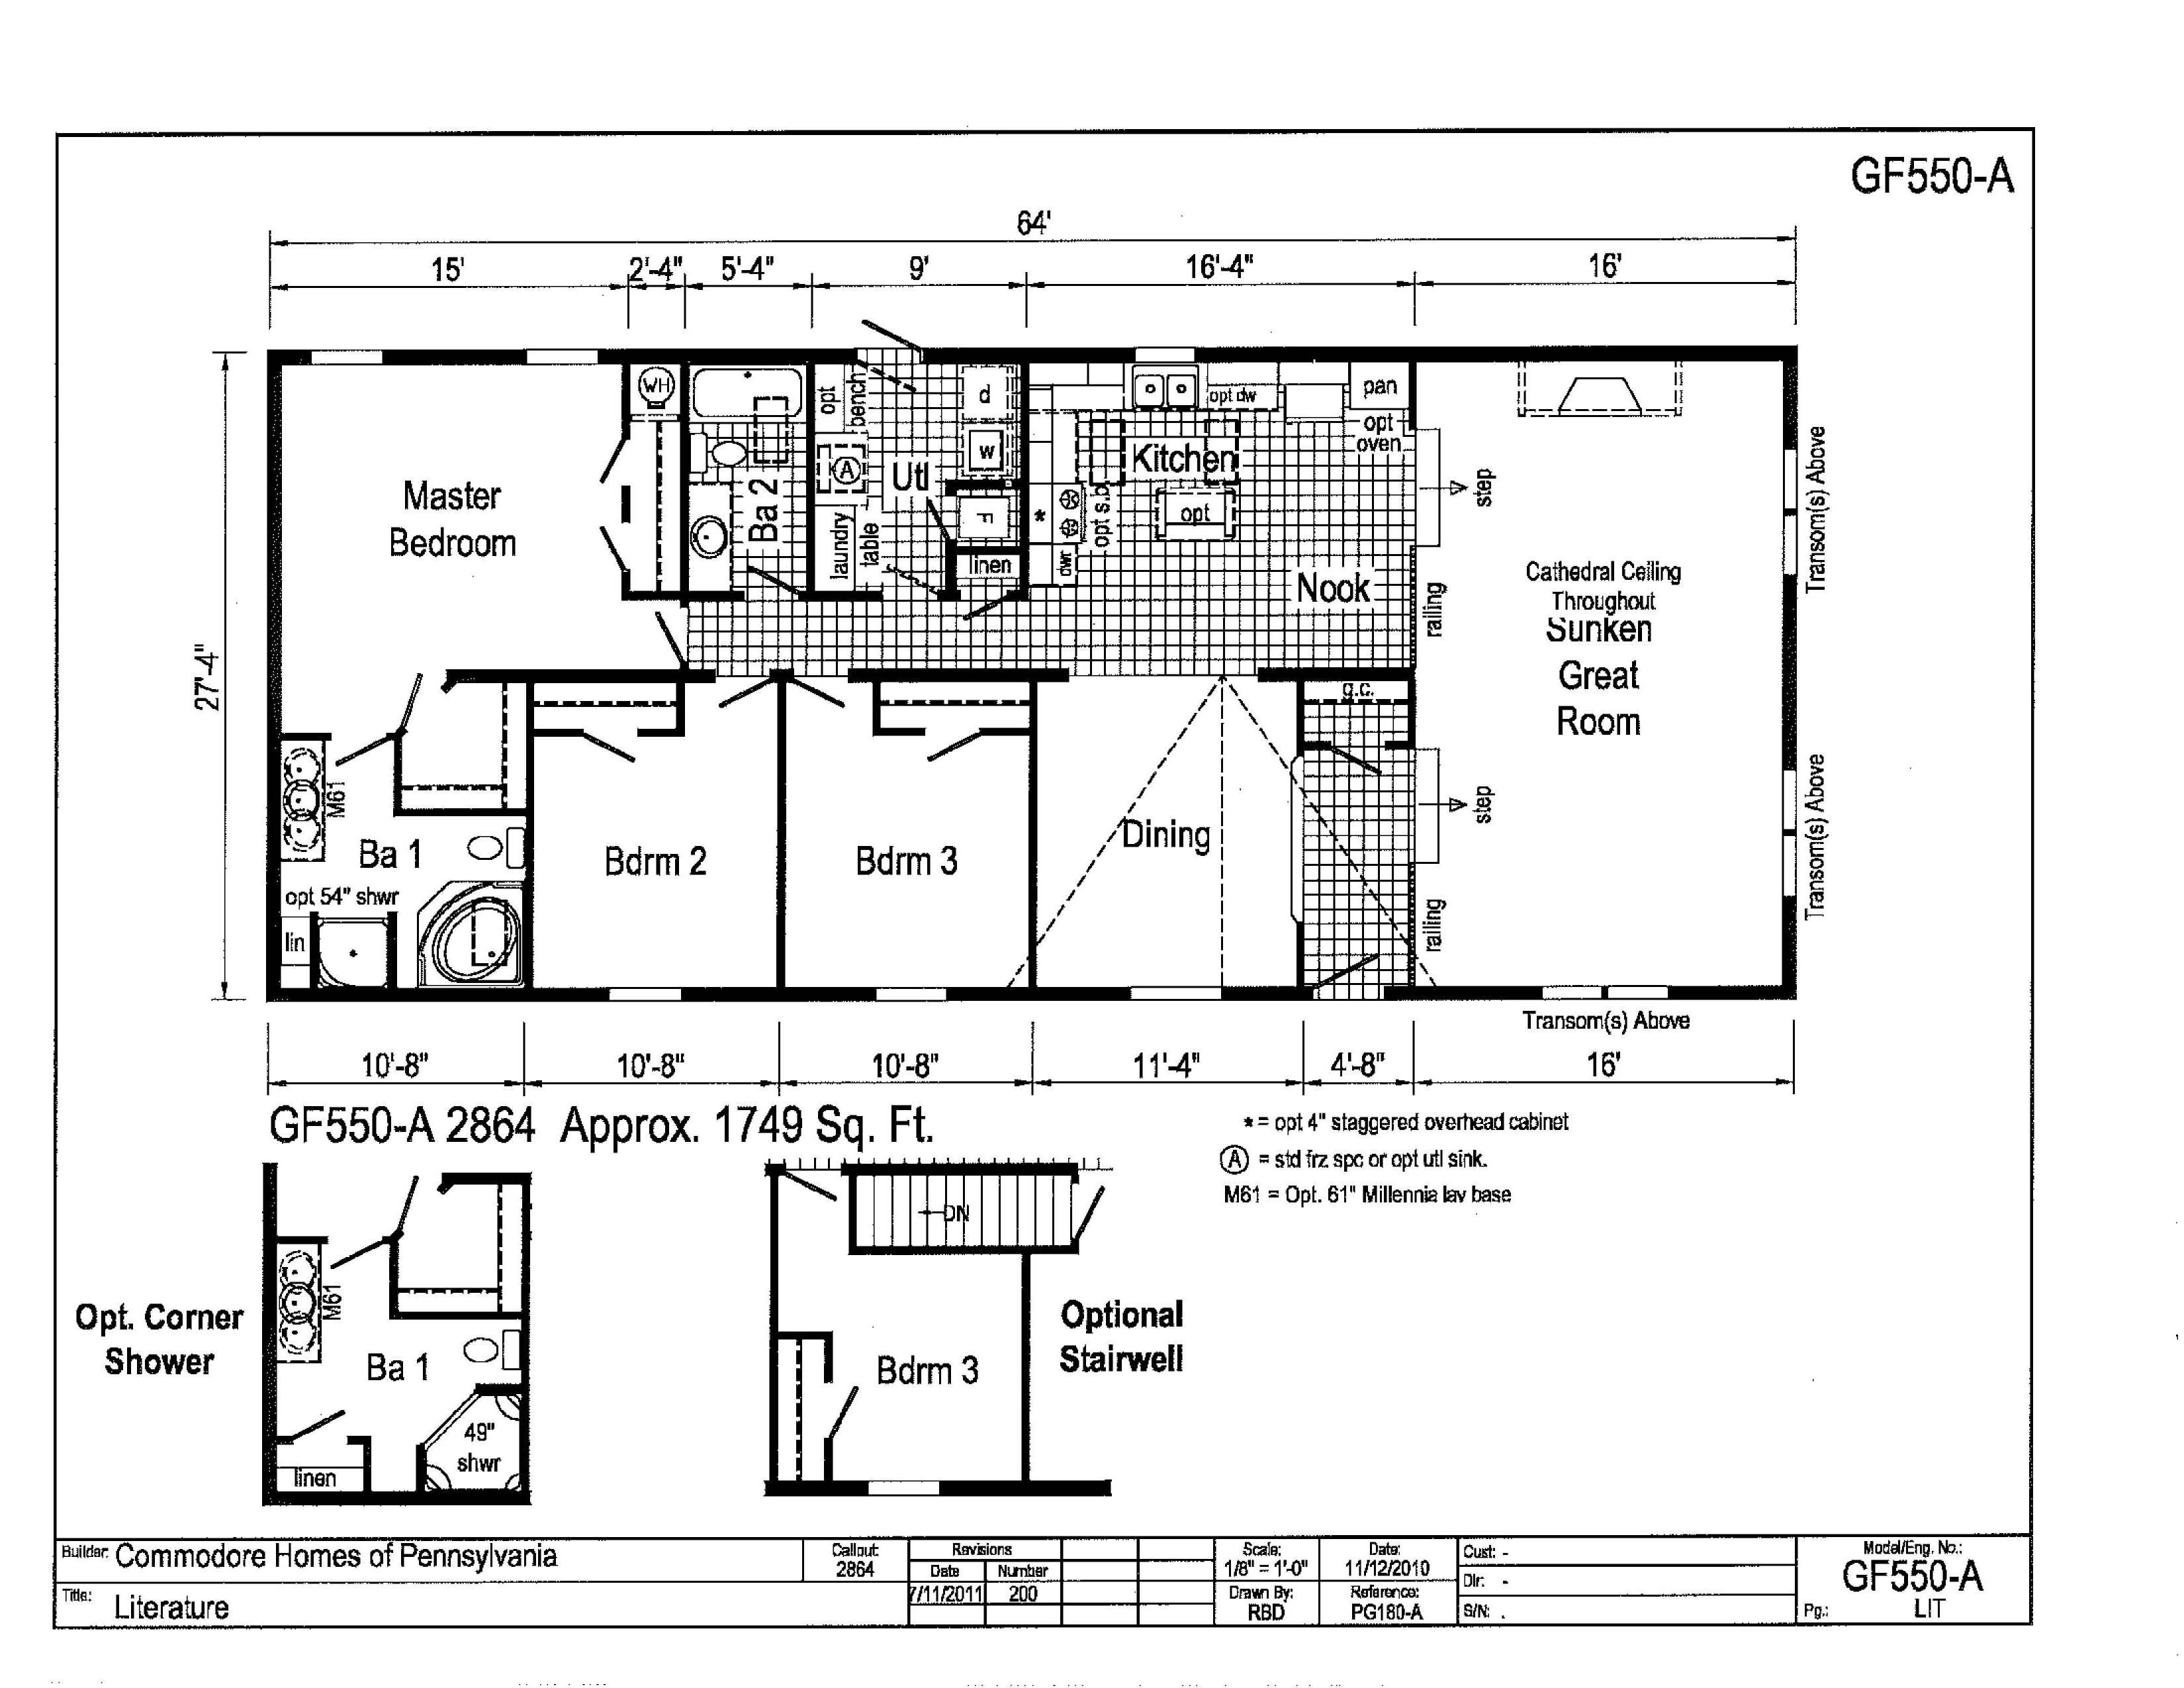 floor plan design online office free designer draw plans | Home ...